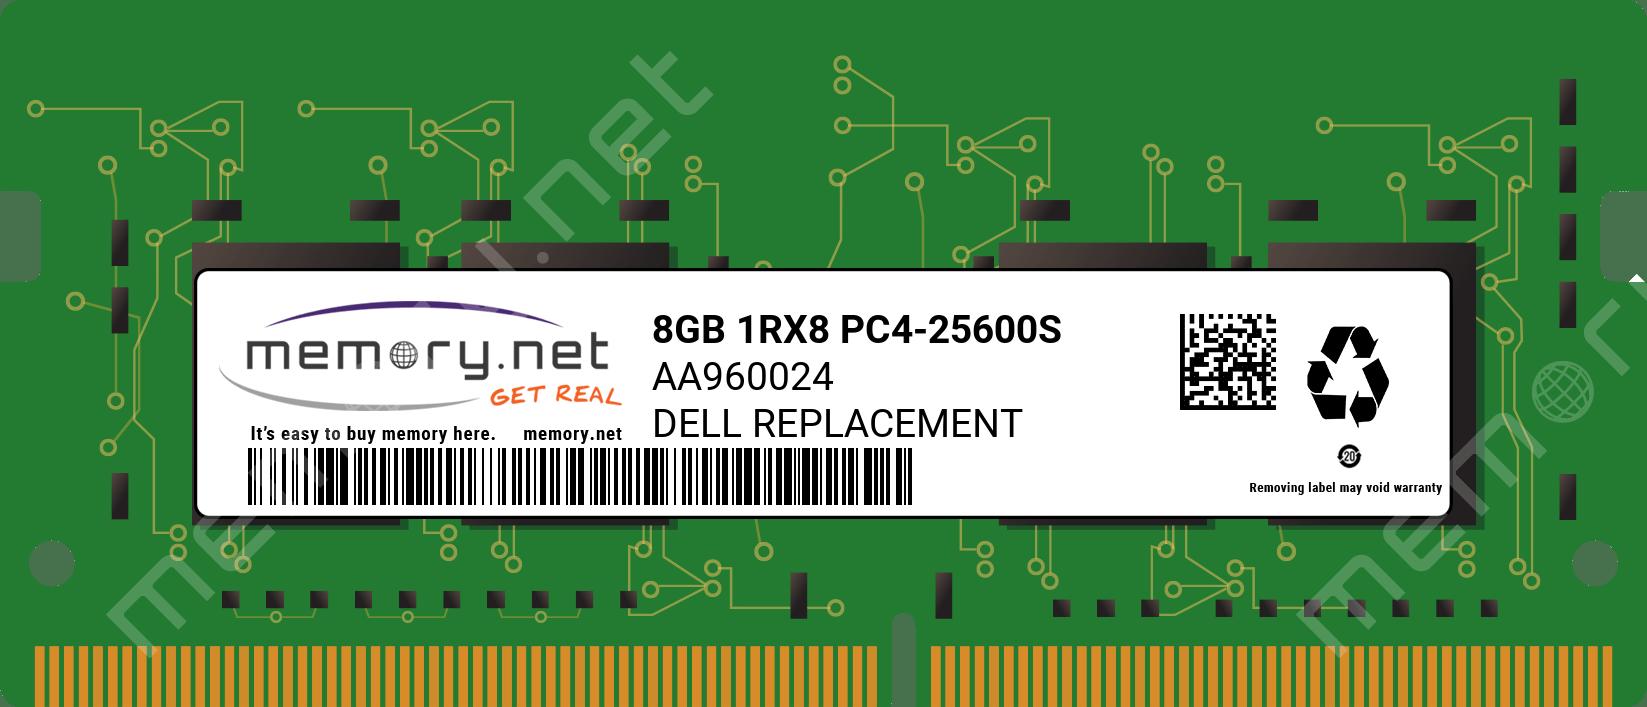 AA960024